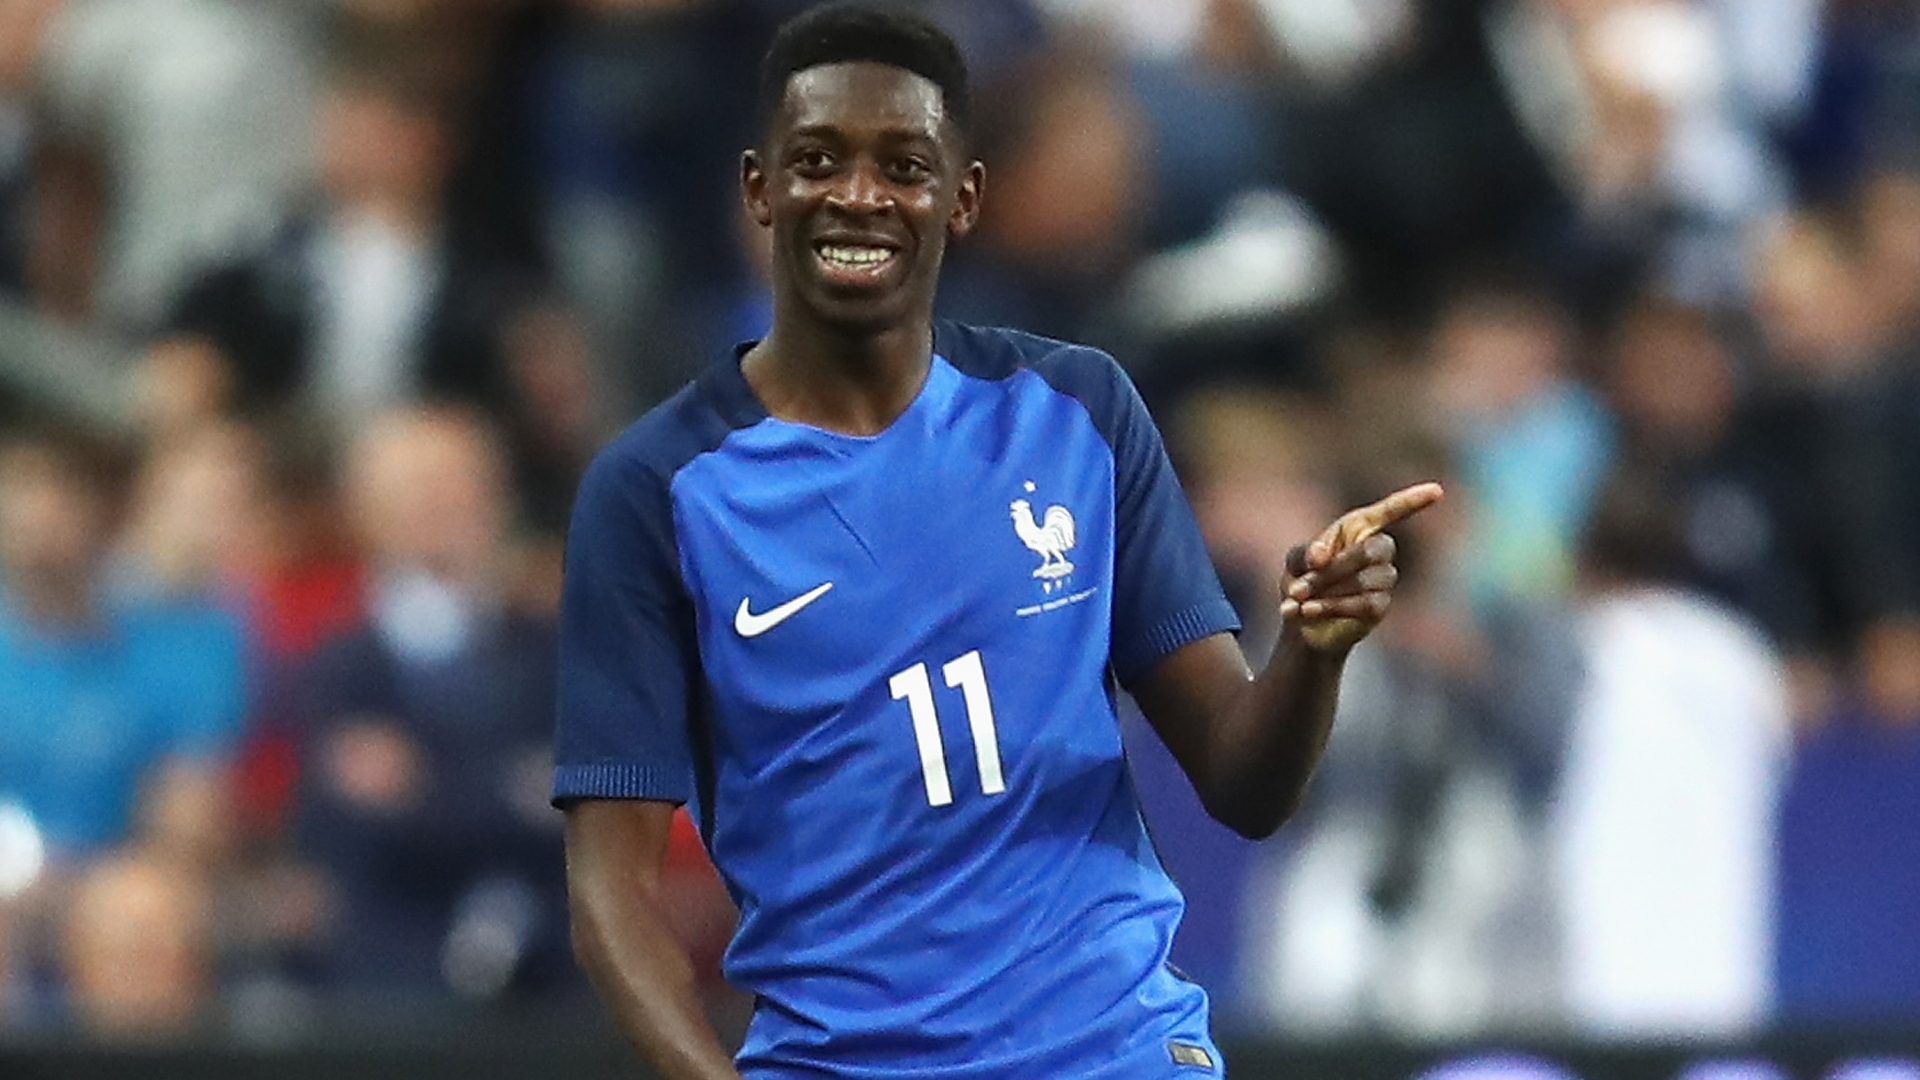 France - Ousmane Dembele